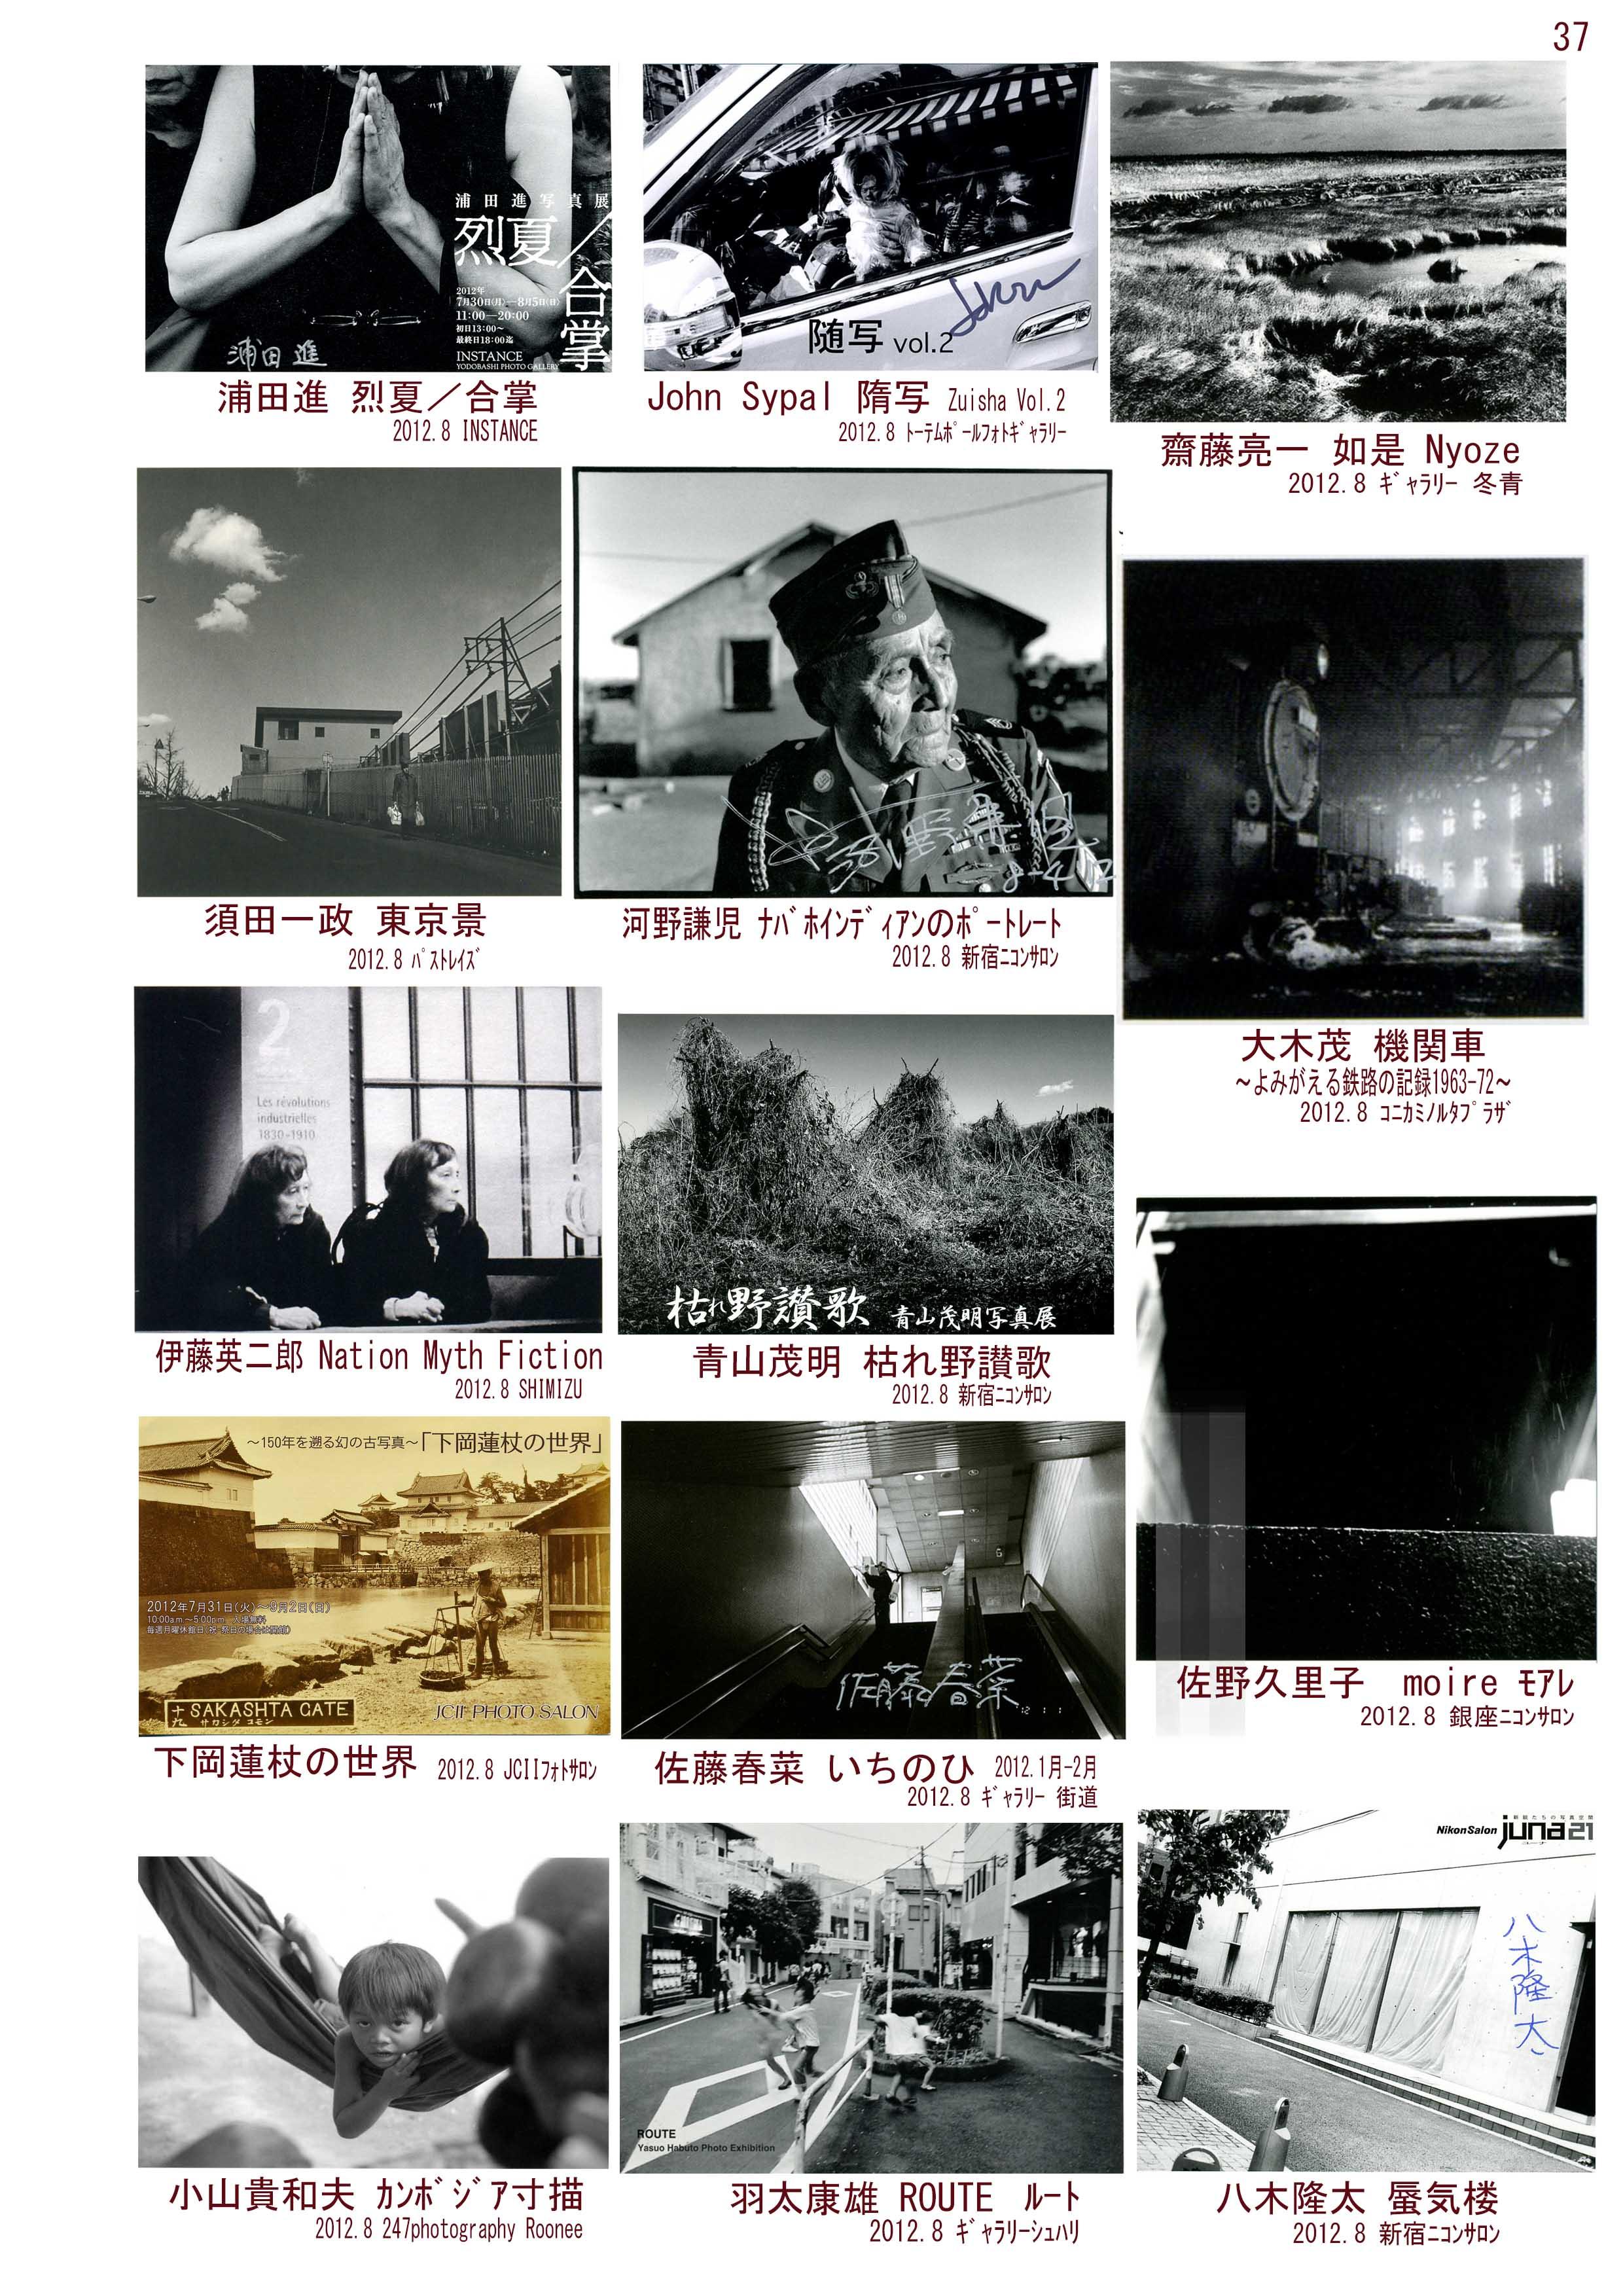 925f3f23a9a39 モノクロ写真展鑑賞記録